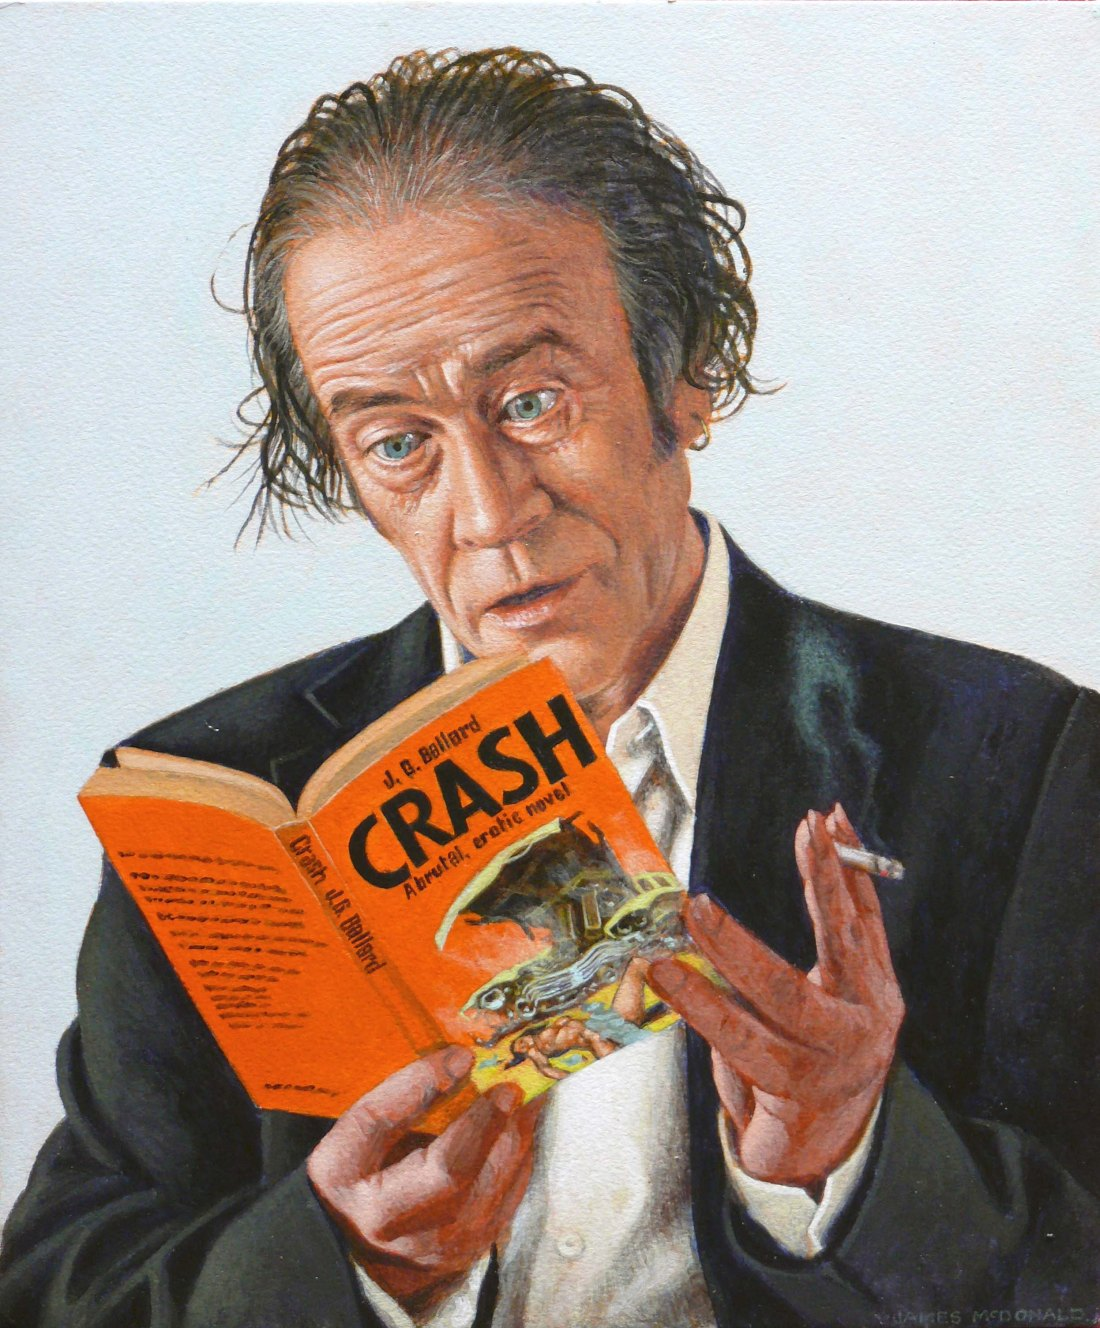 CRASH final version JAMES McDONALD Acrylic on Paper 12x10 inches 2015 post